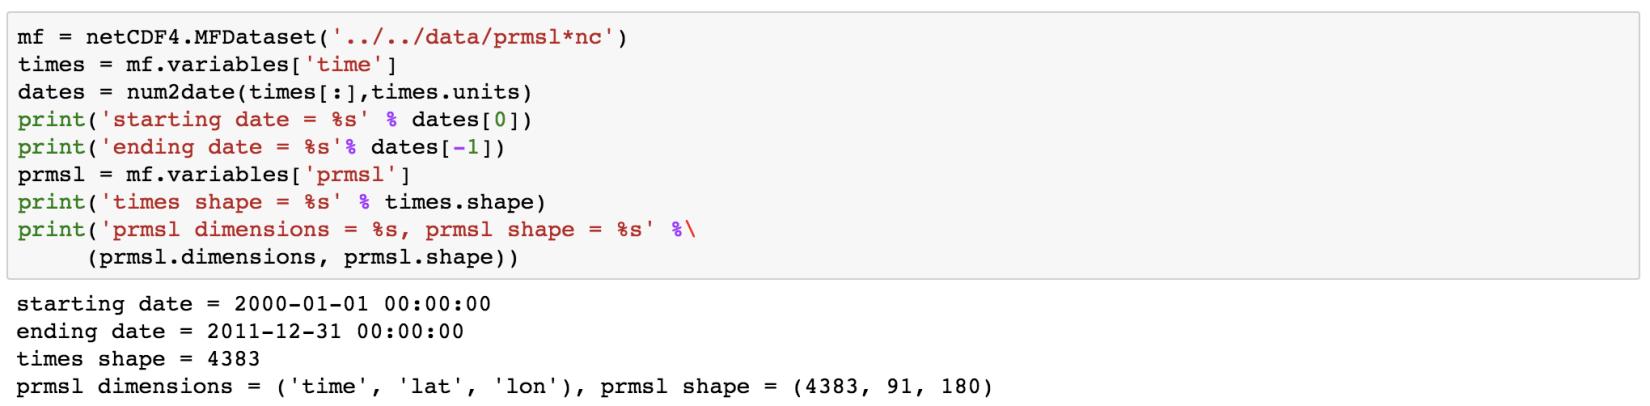 Reading netcdf4 data in python